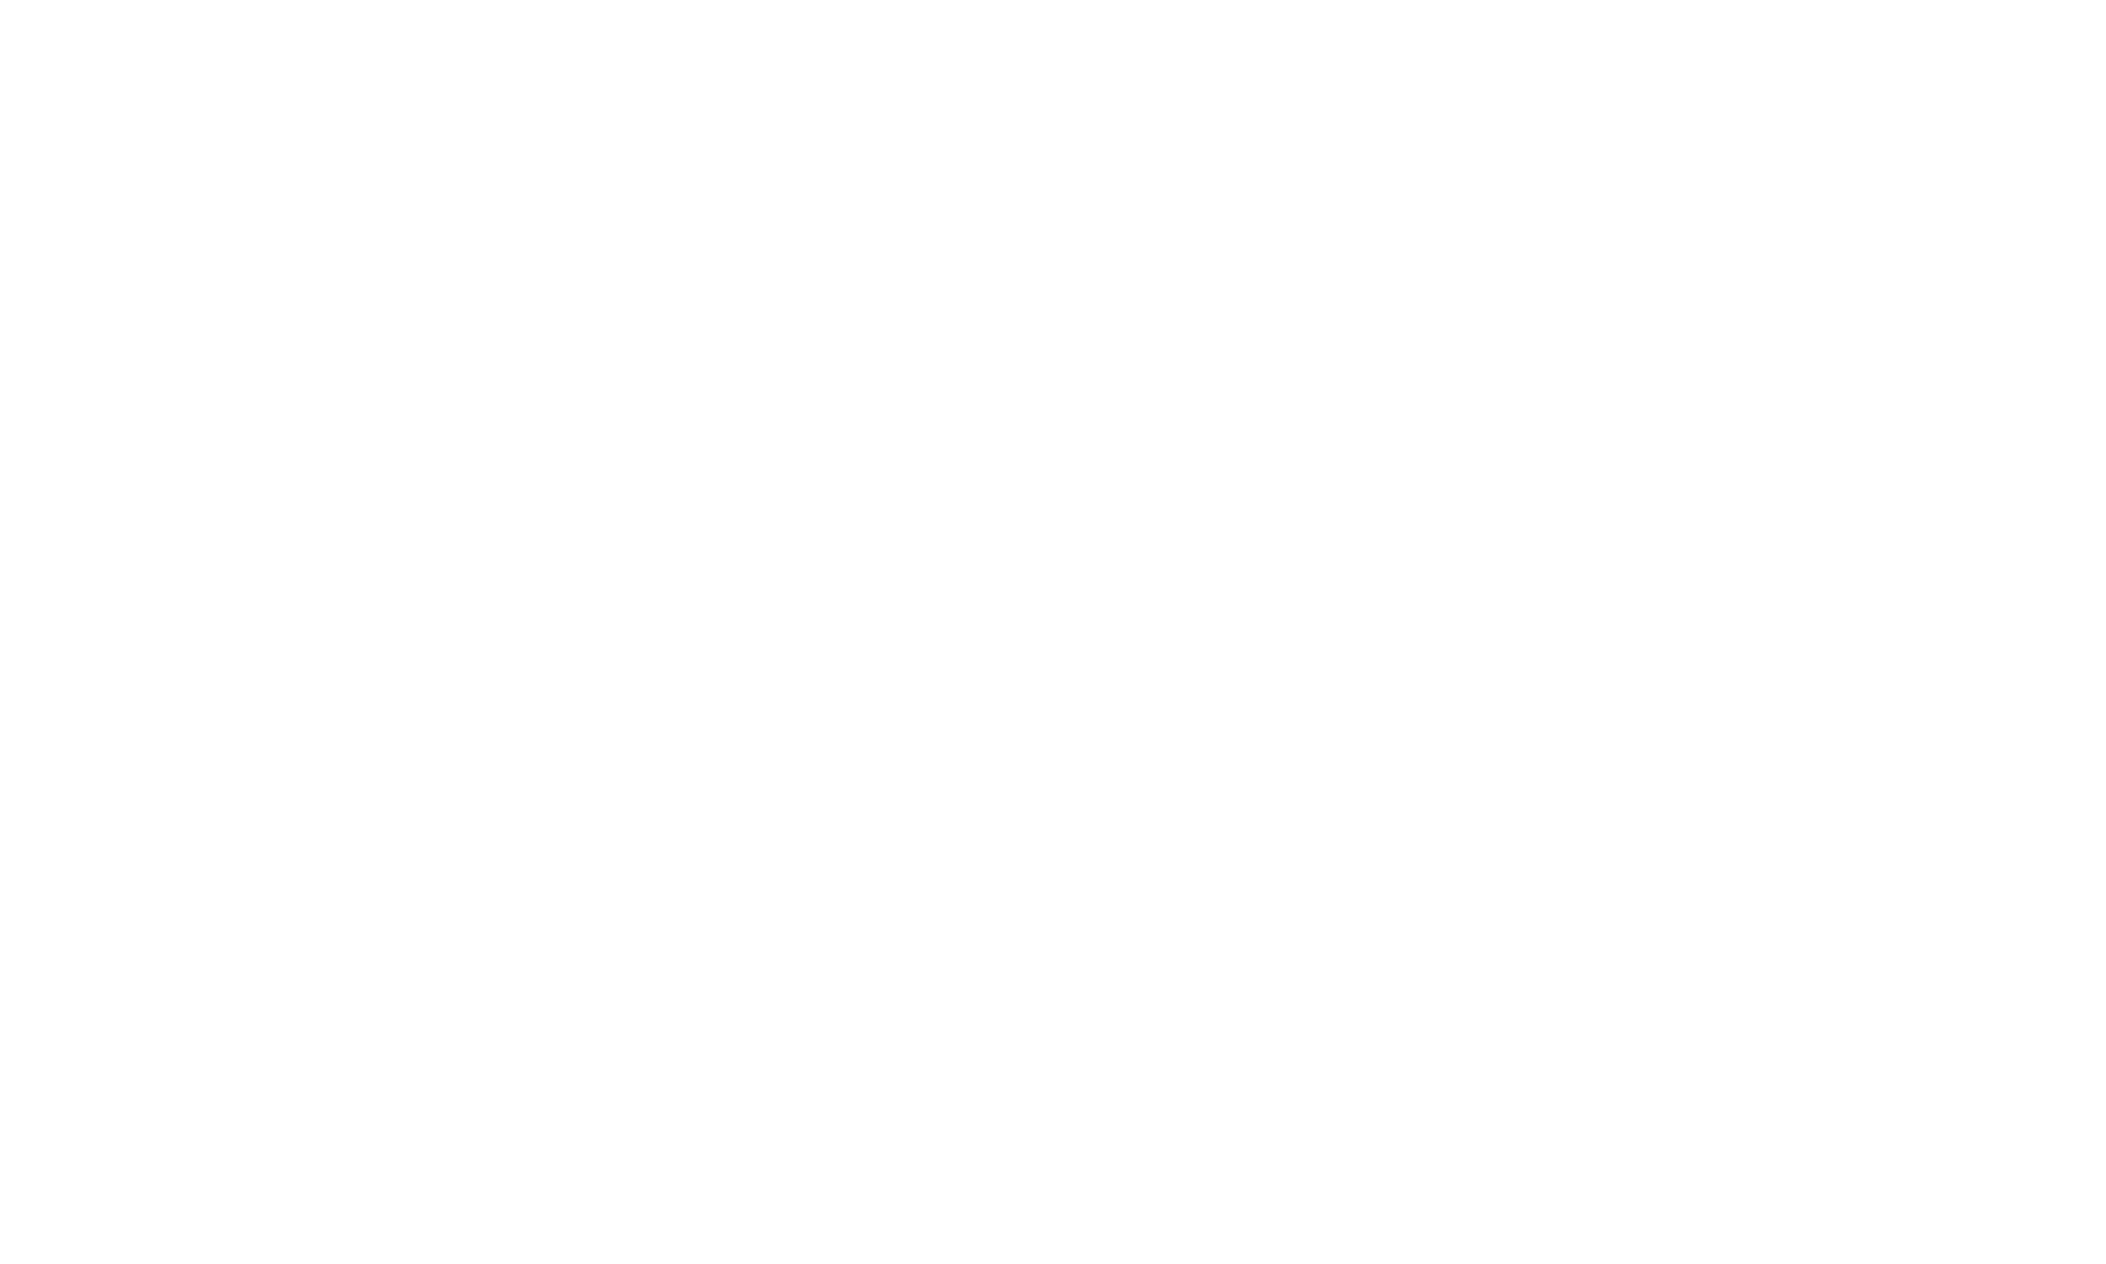 Startup-Logo (Knockout).png